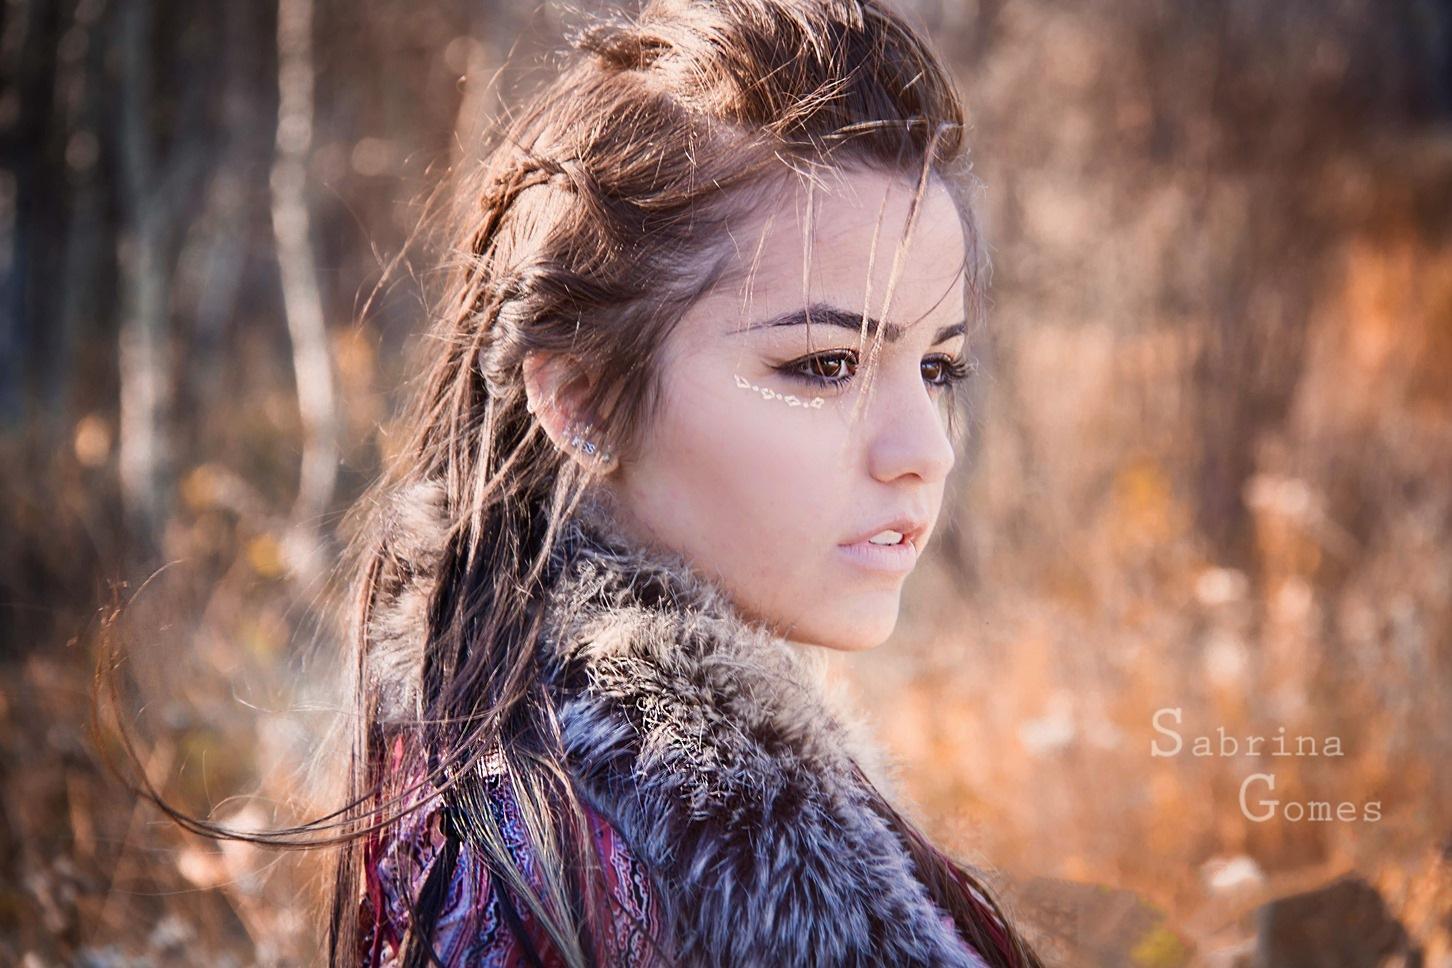 She by Sabrina Gomes